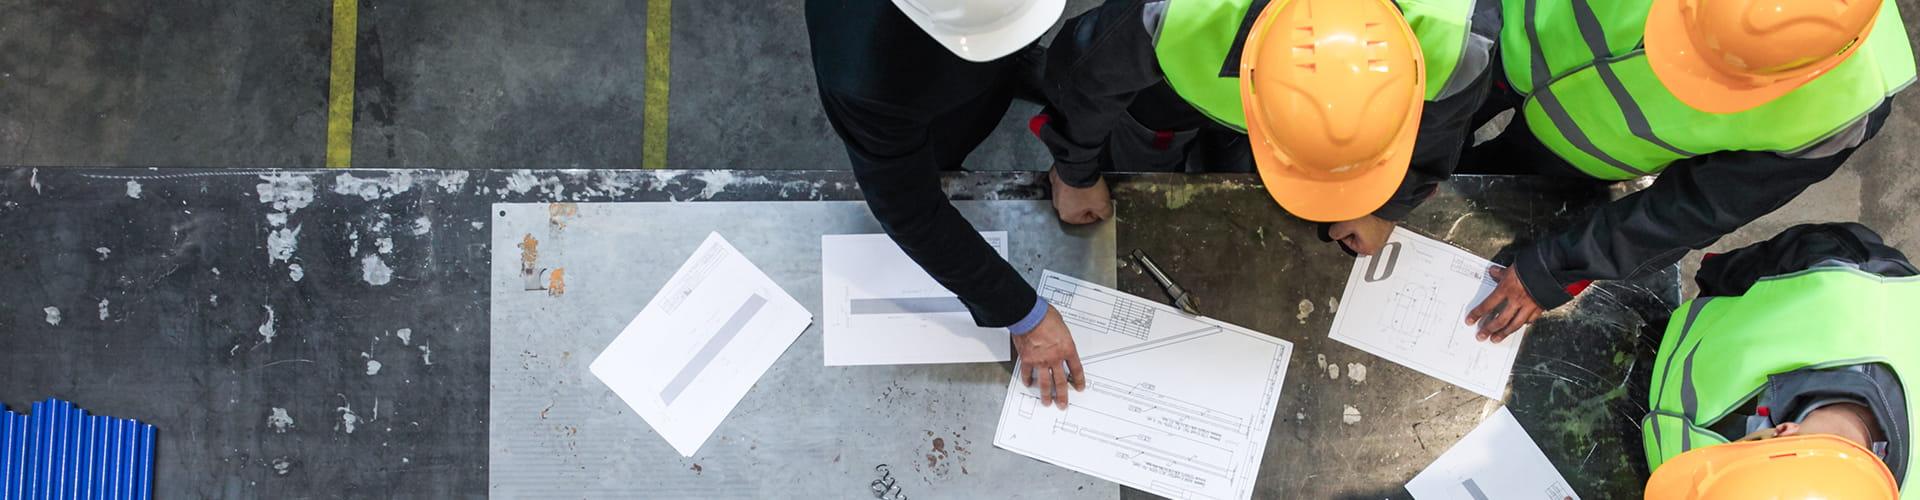 Workers in hard hats looking over paperwork